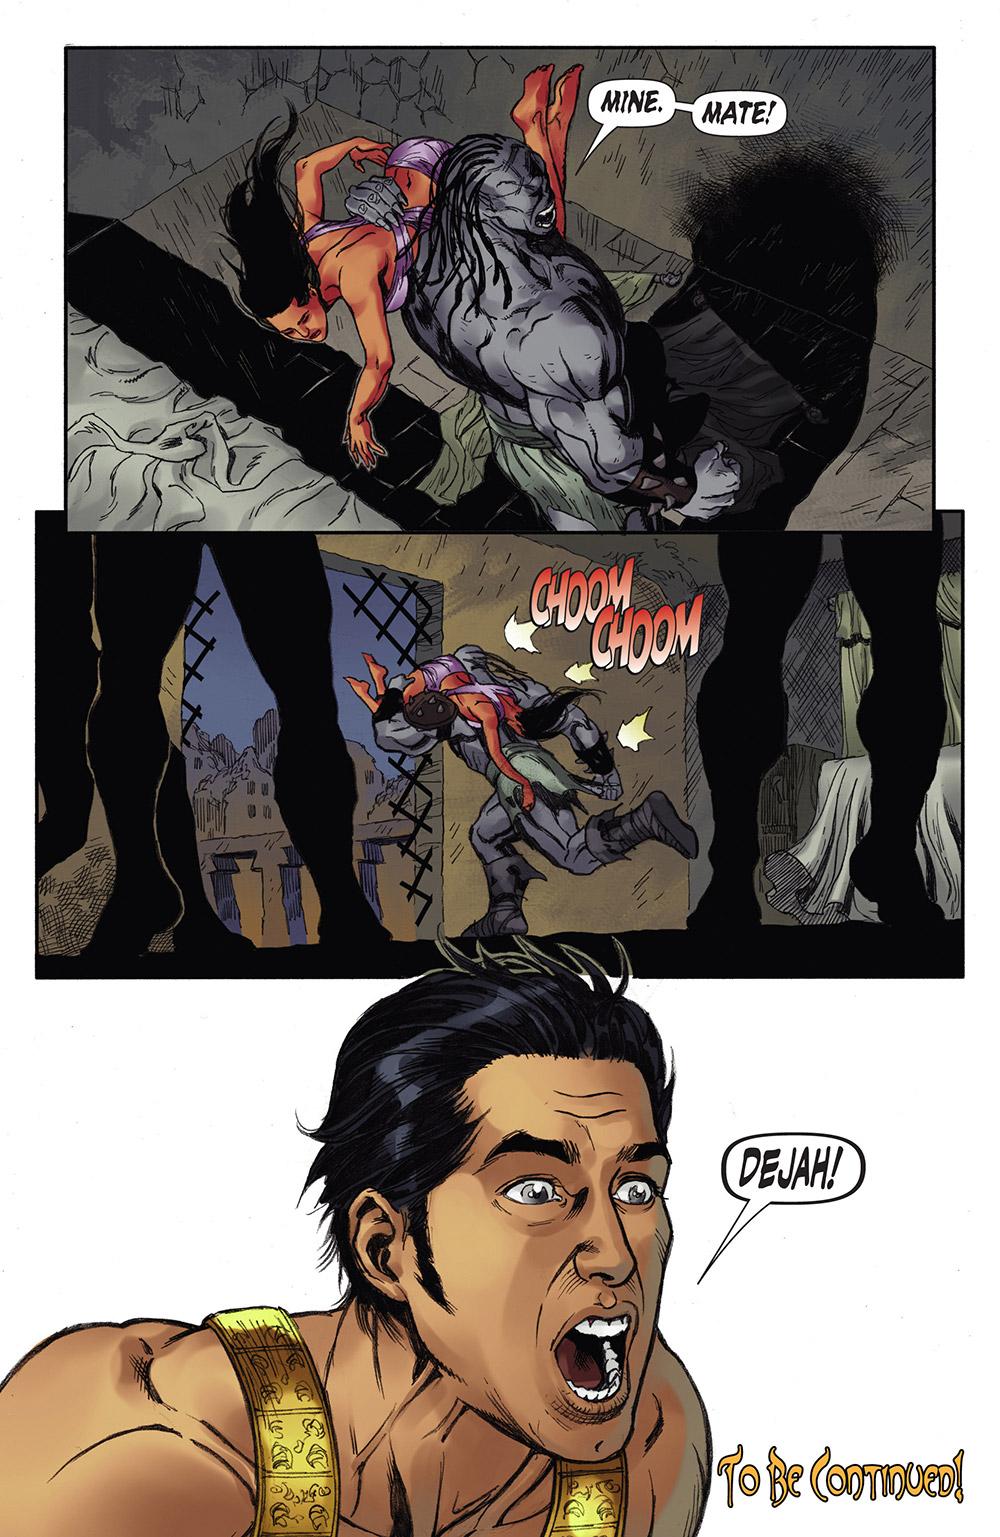 john carter warlord of mars viewcomic reading comics online for